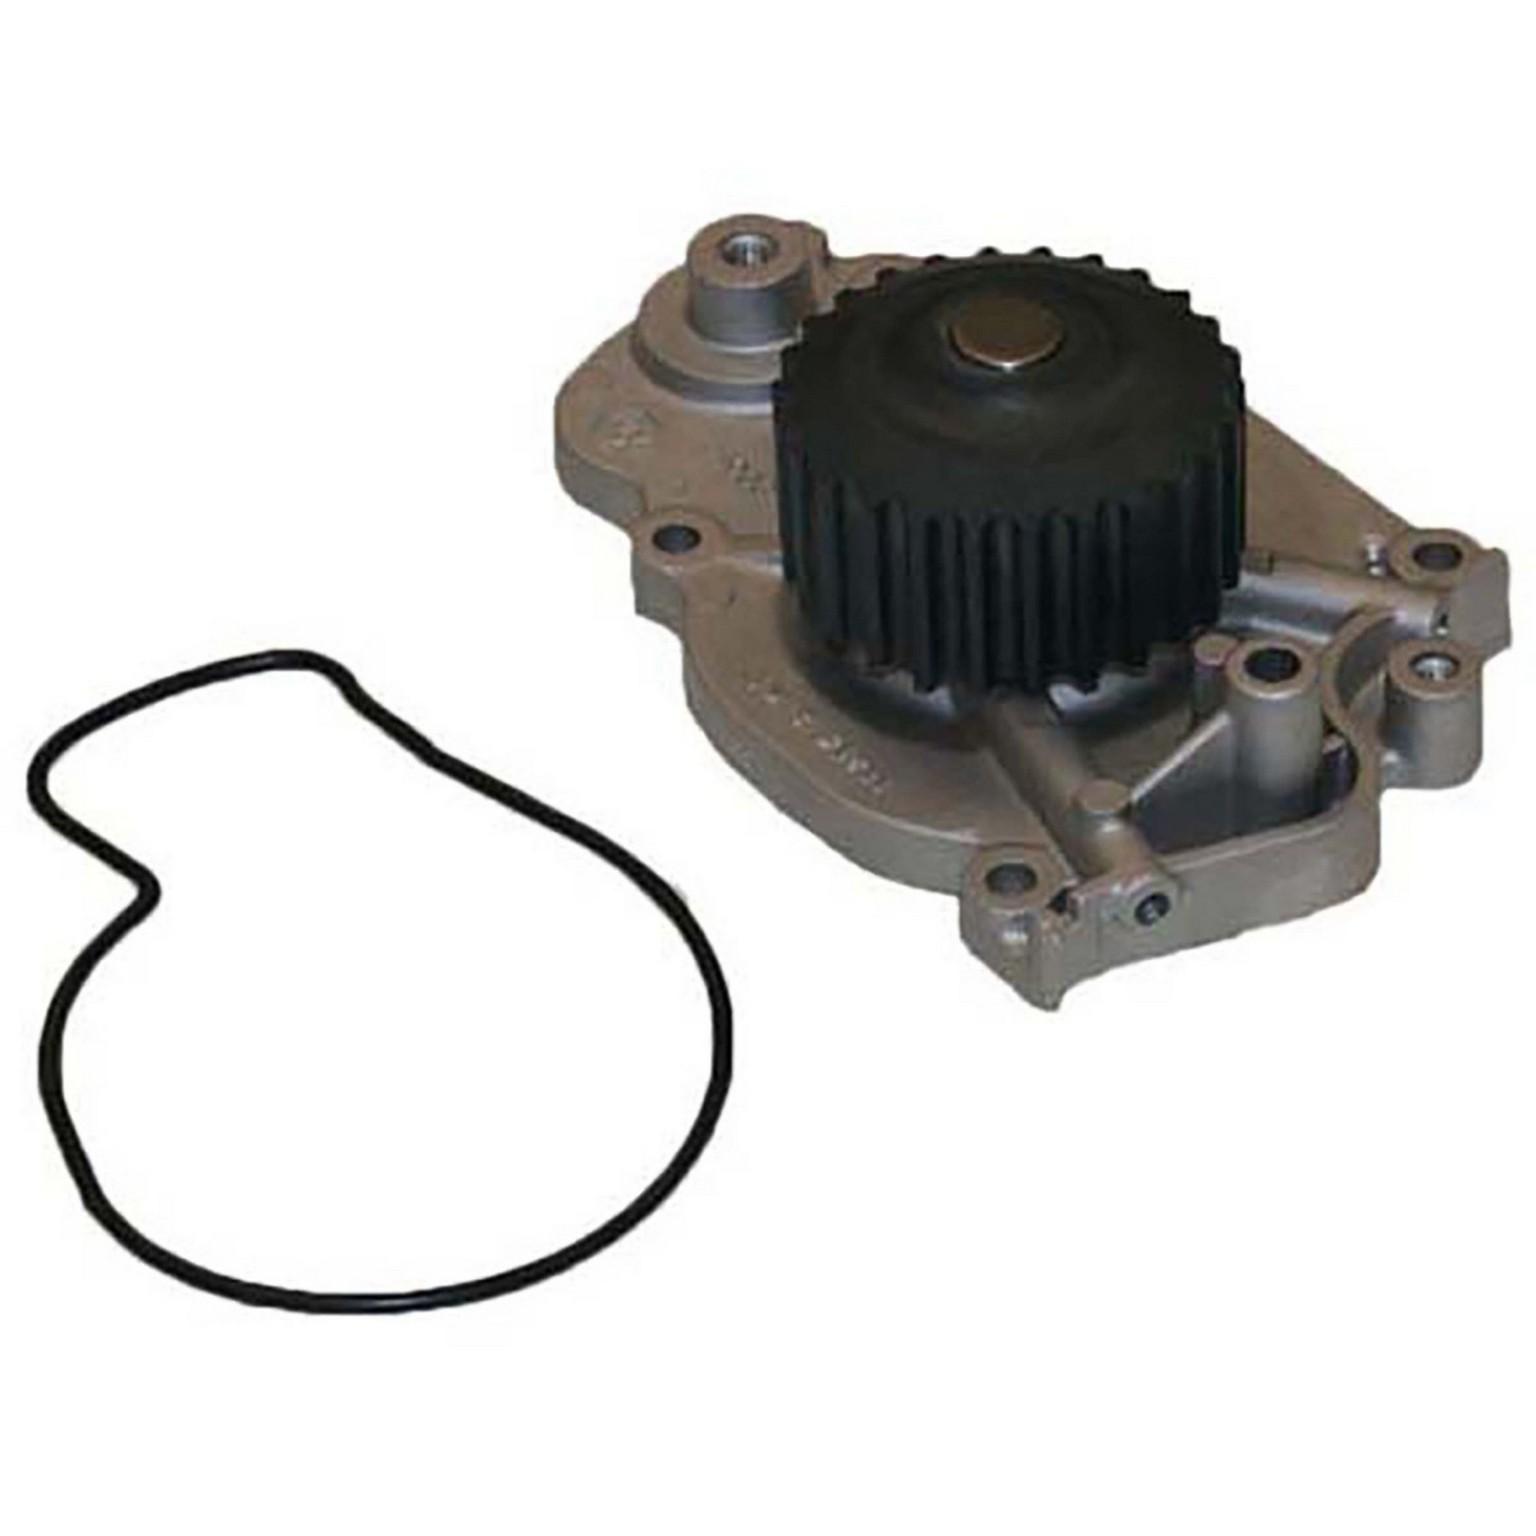 1999 Honda Prelude Engine Water Pump G6 135 1330